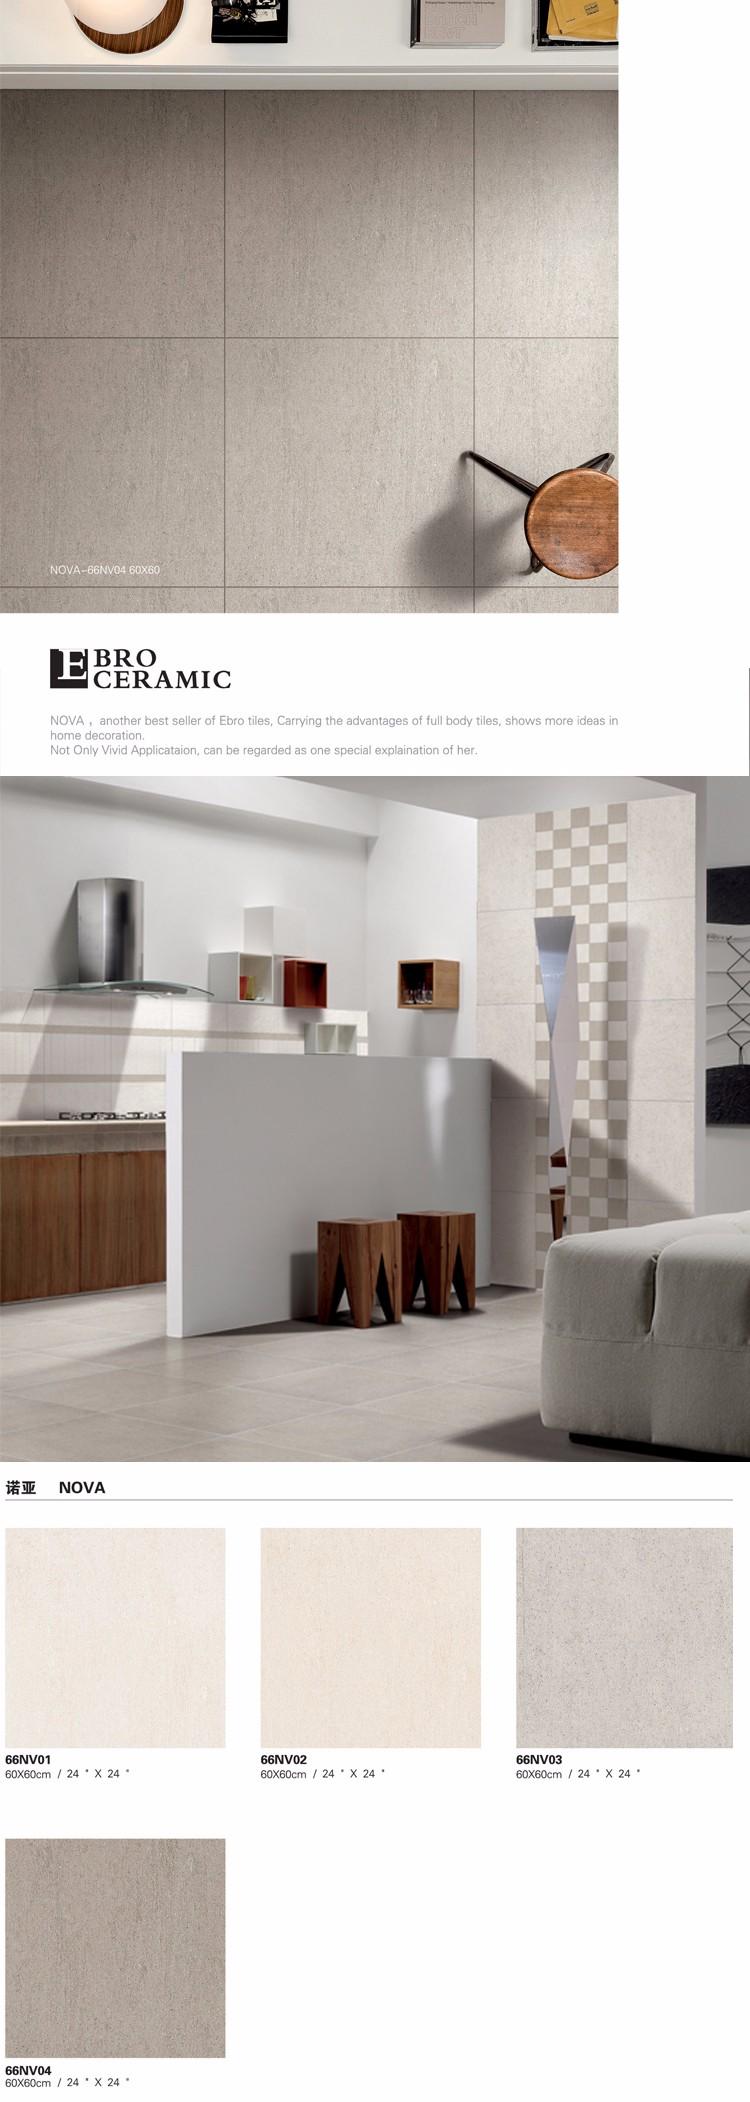 Homogenous Tile 60x60 : homogenous, 60x60, Canton, Tiles, Design, Surface, Homogenous, Tiles,, Design,, CERAMIC, Product, Details, Foshan, Ceramic, Alibaba.com